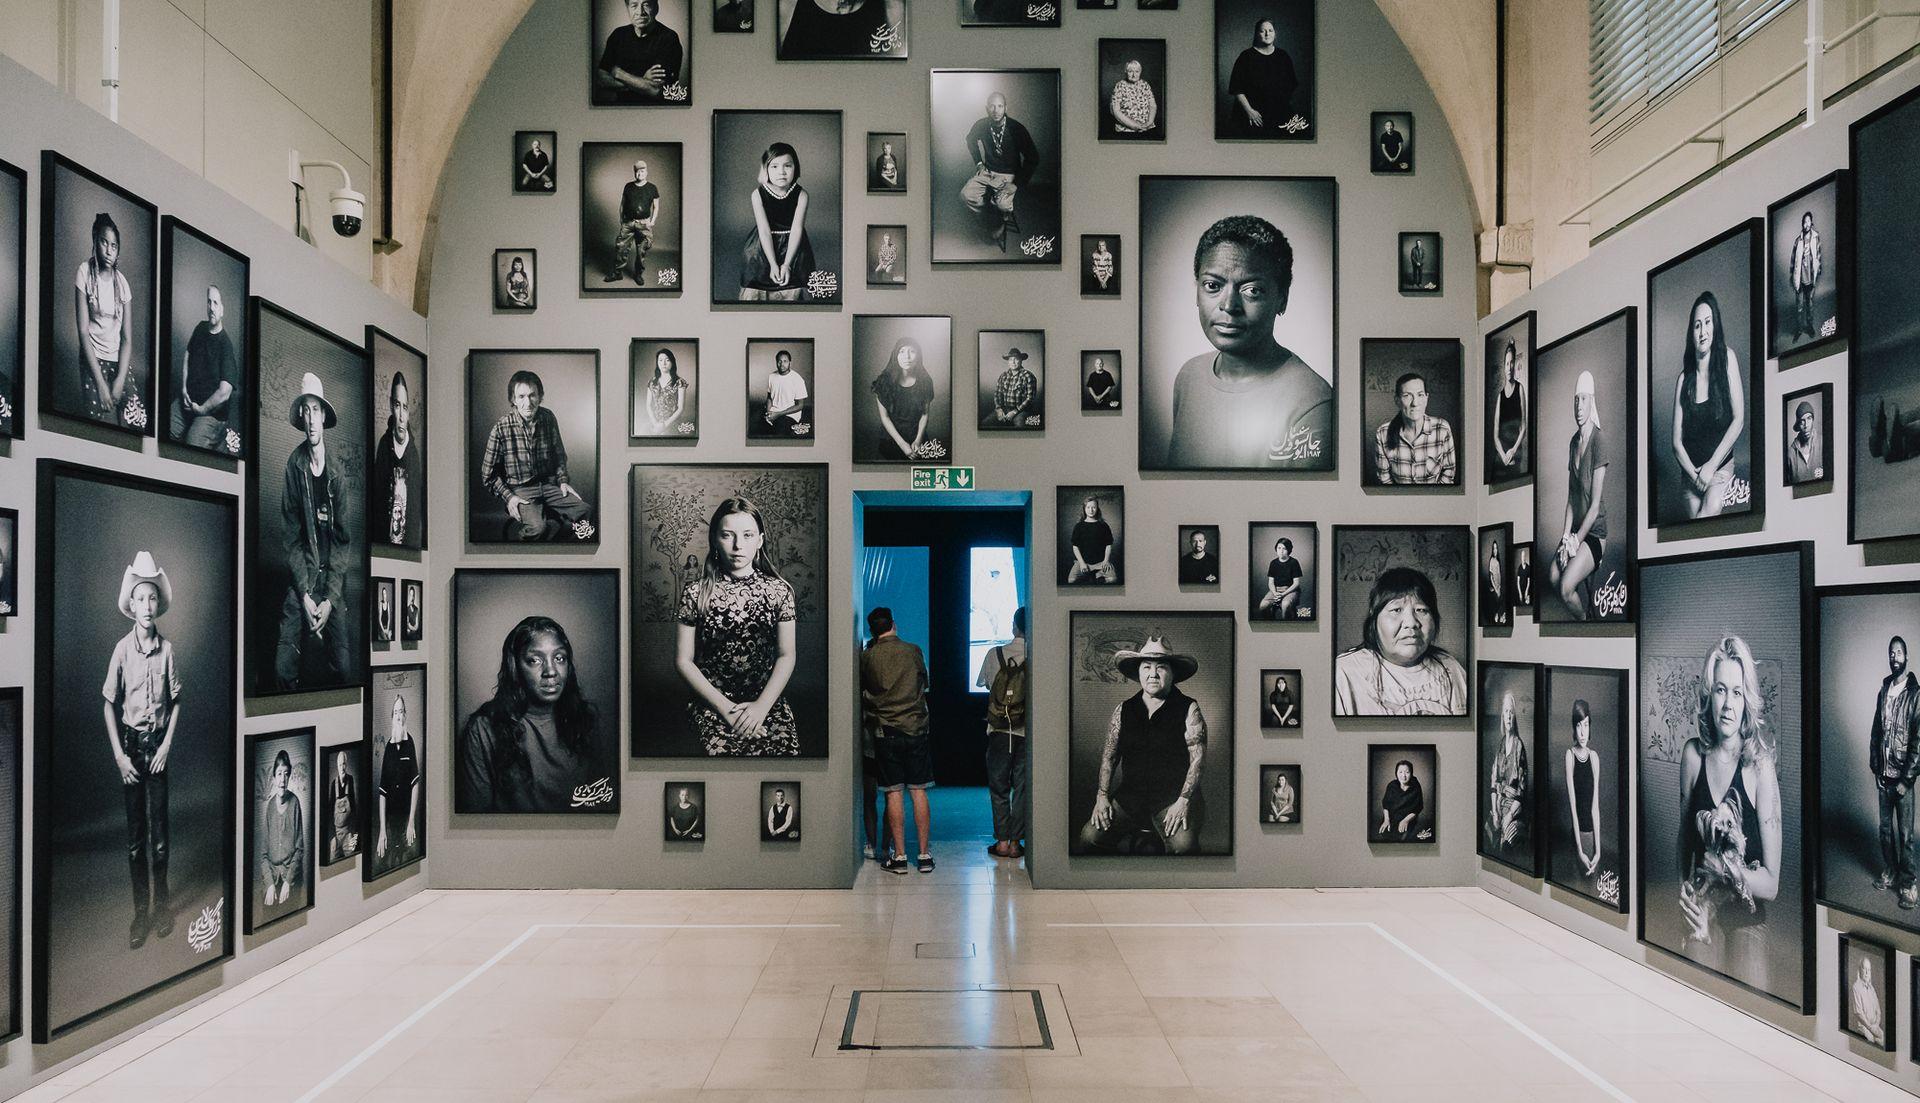 Shirin Neshat's installation at Photo London Courtesy the artist and Goodman Gallery, London